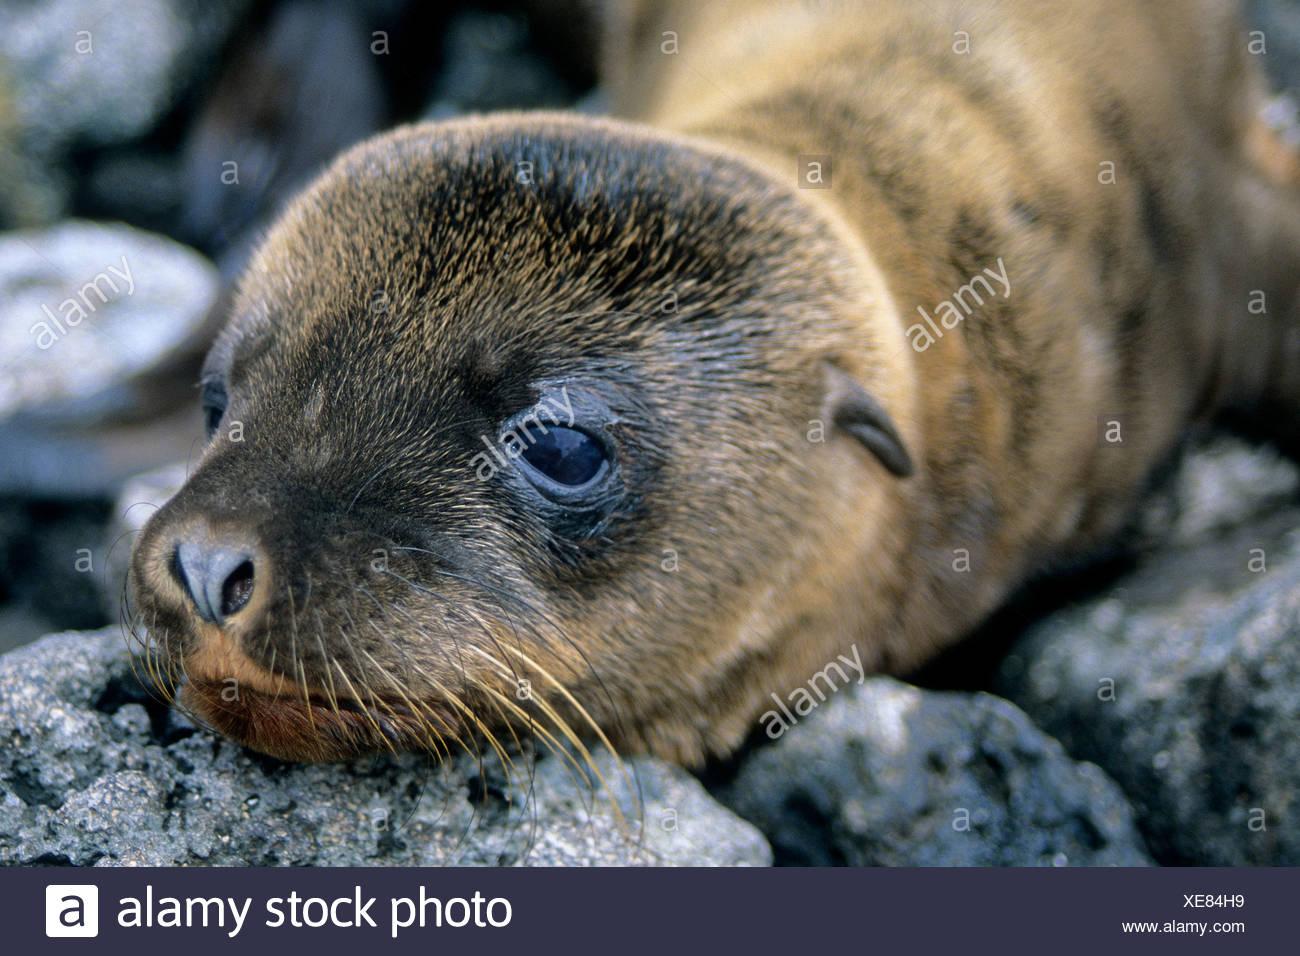 California sea lion pup (Zalophus californicus wollebacki), James Island, Galapagos Archipelago, Ecuador Stock Photo